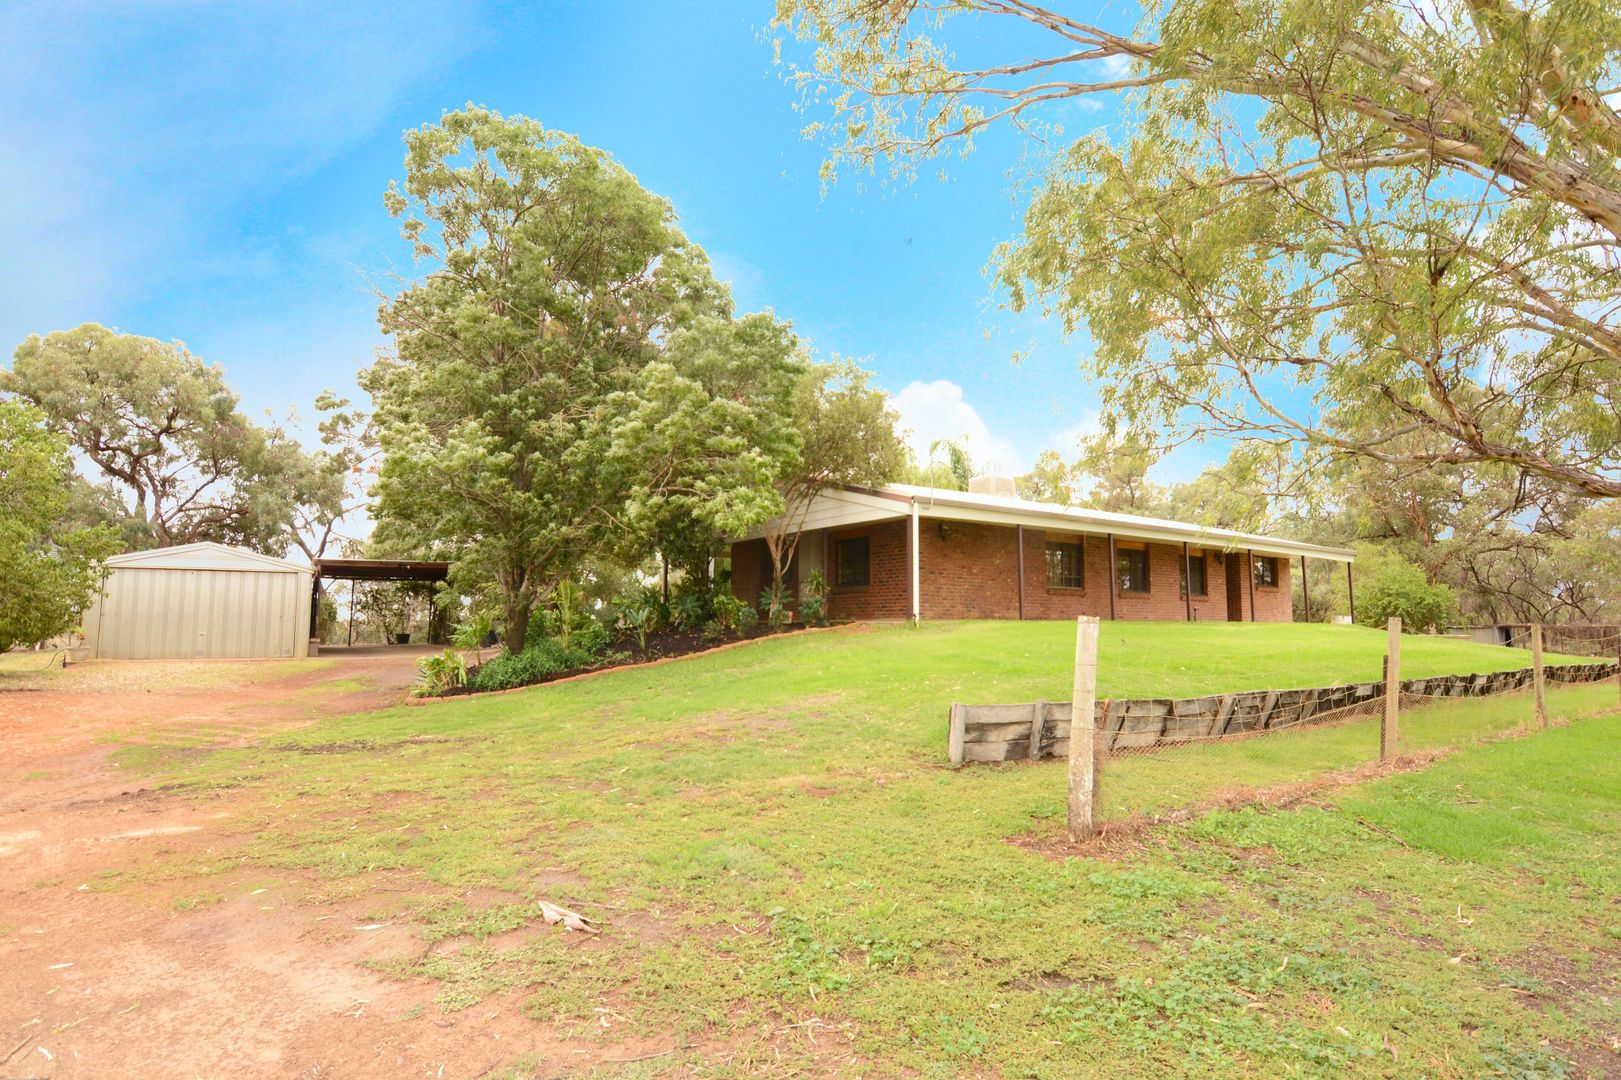 75B Delta Road, Wentworth NSW 2648